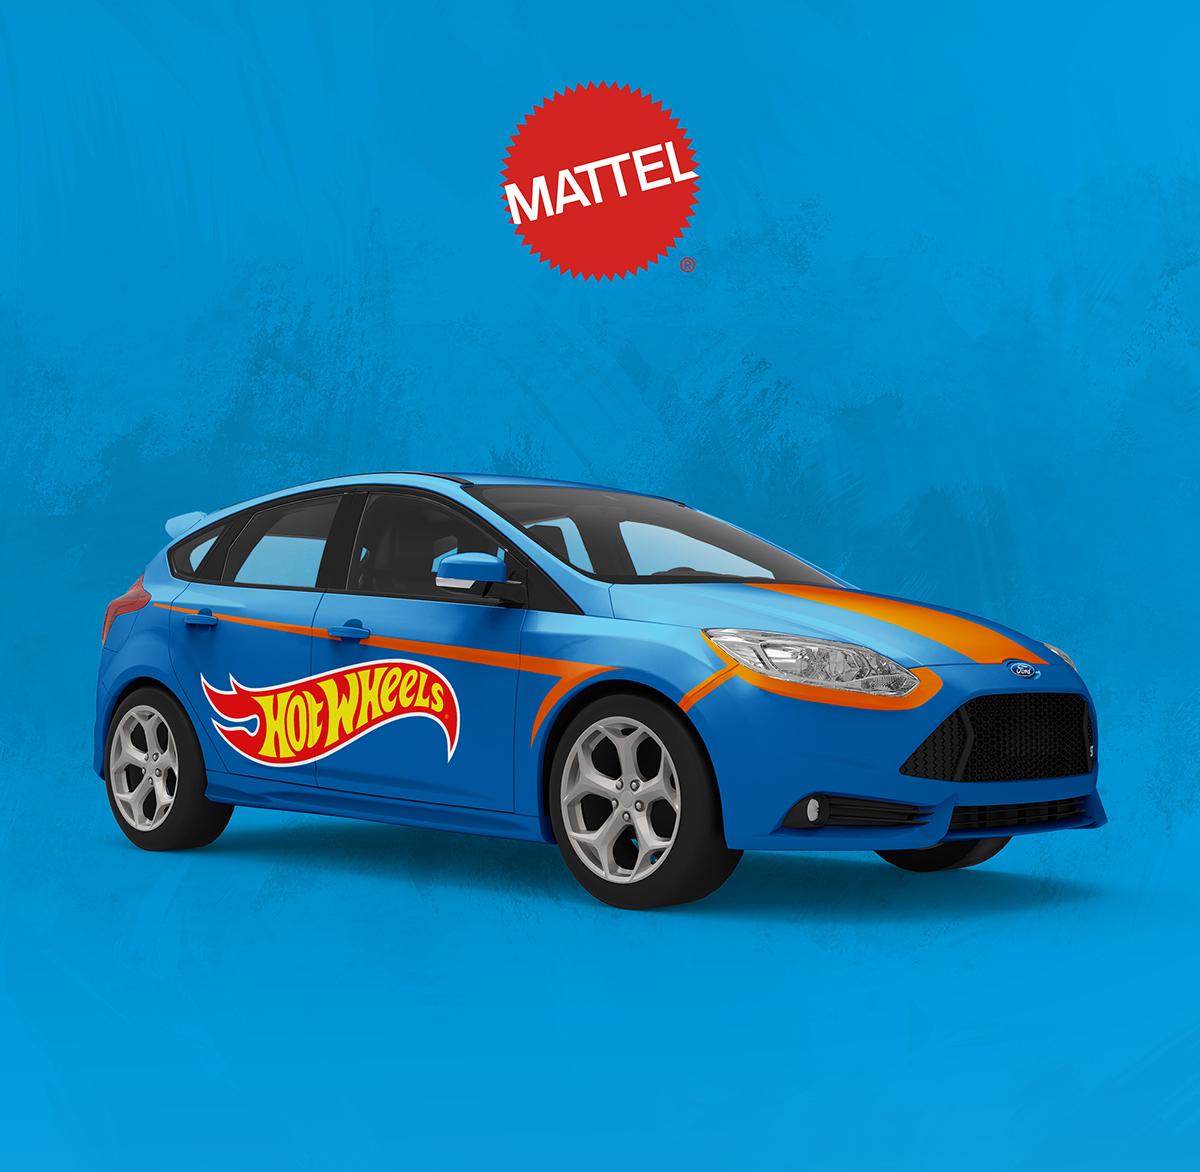 Mattel Hot Wheels Campaign